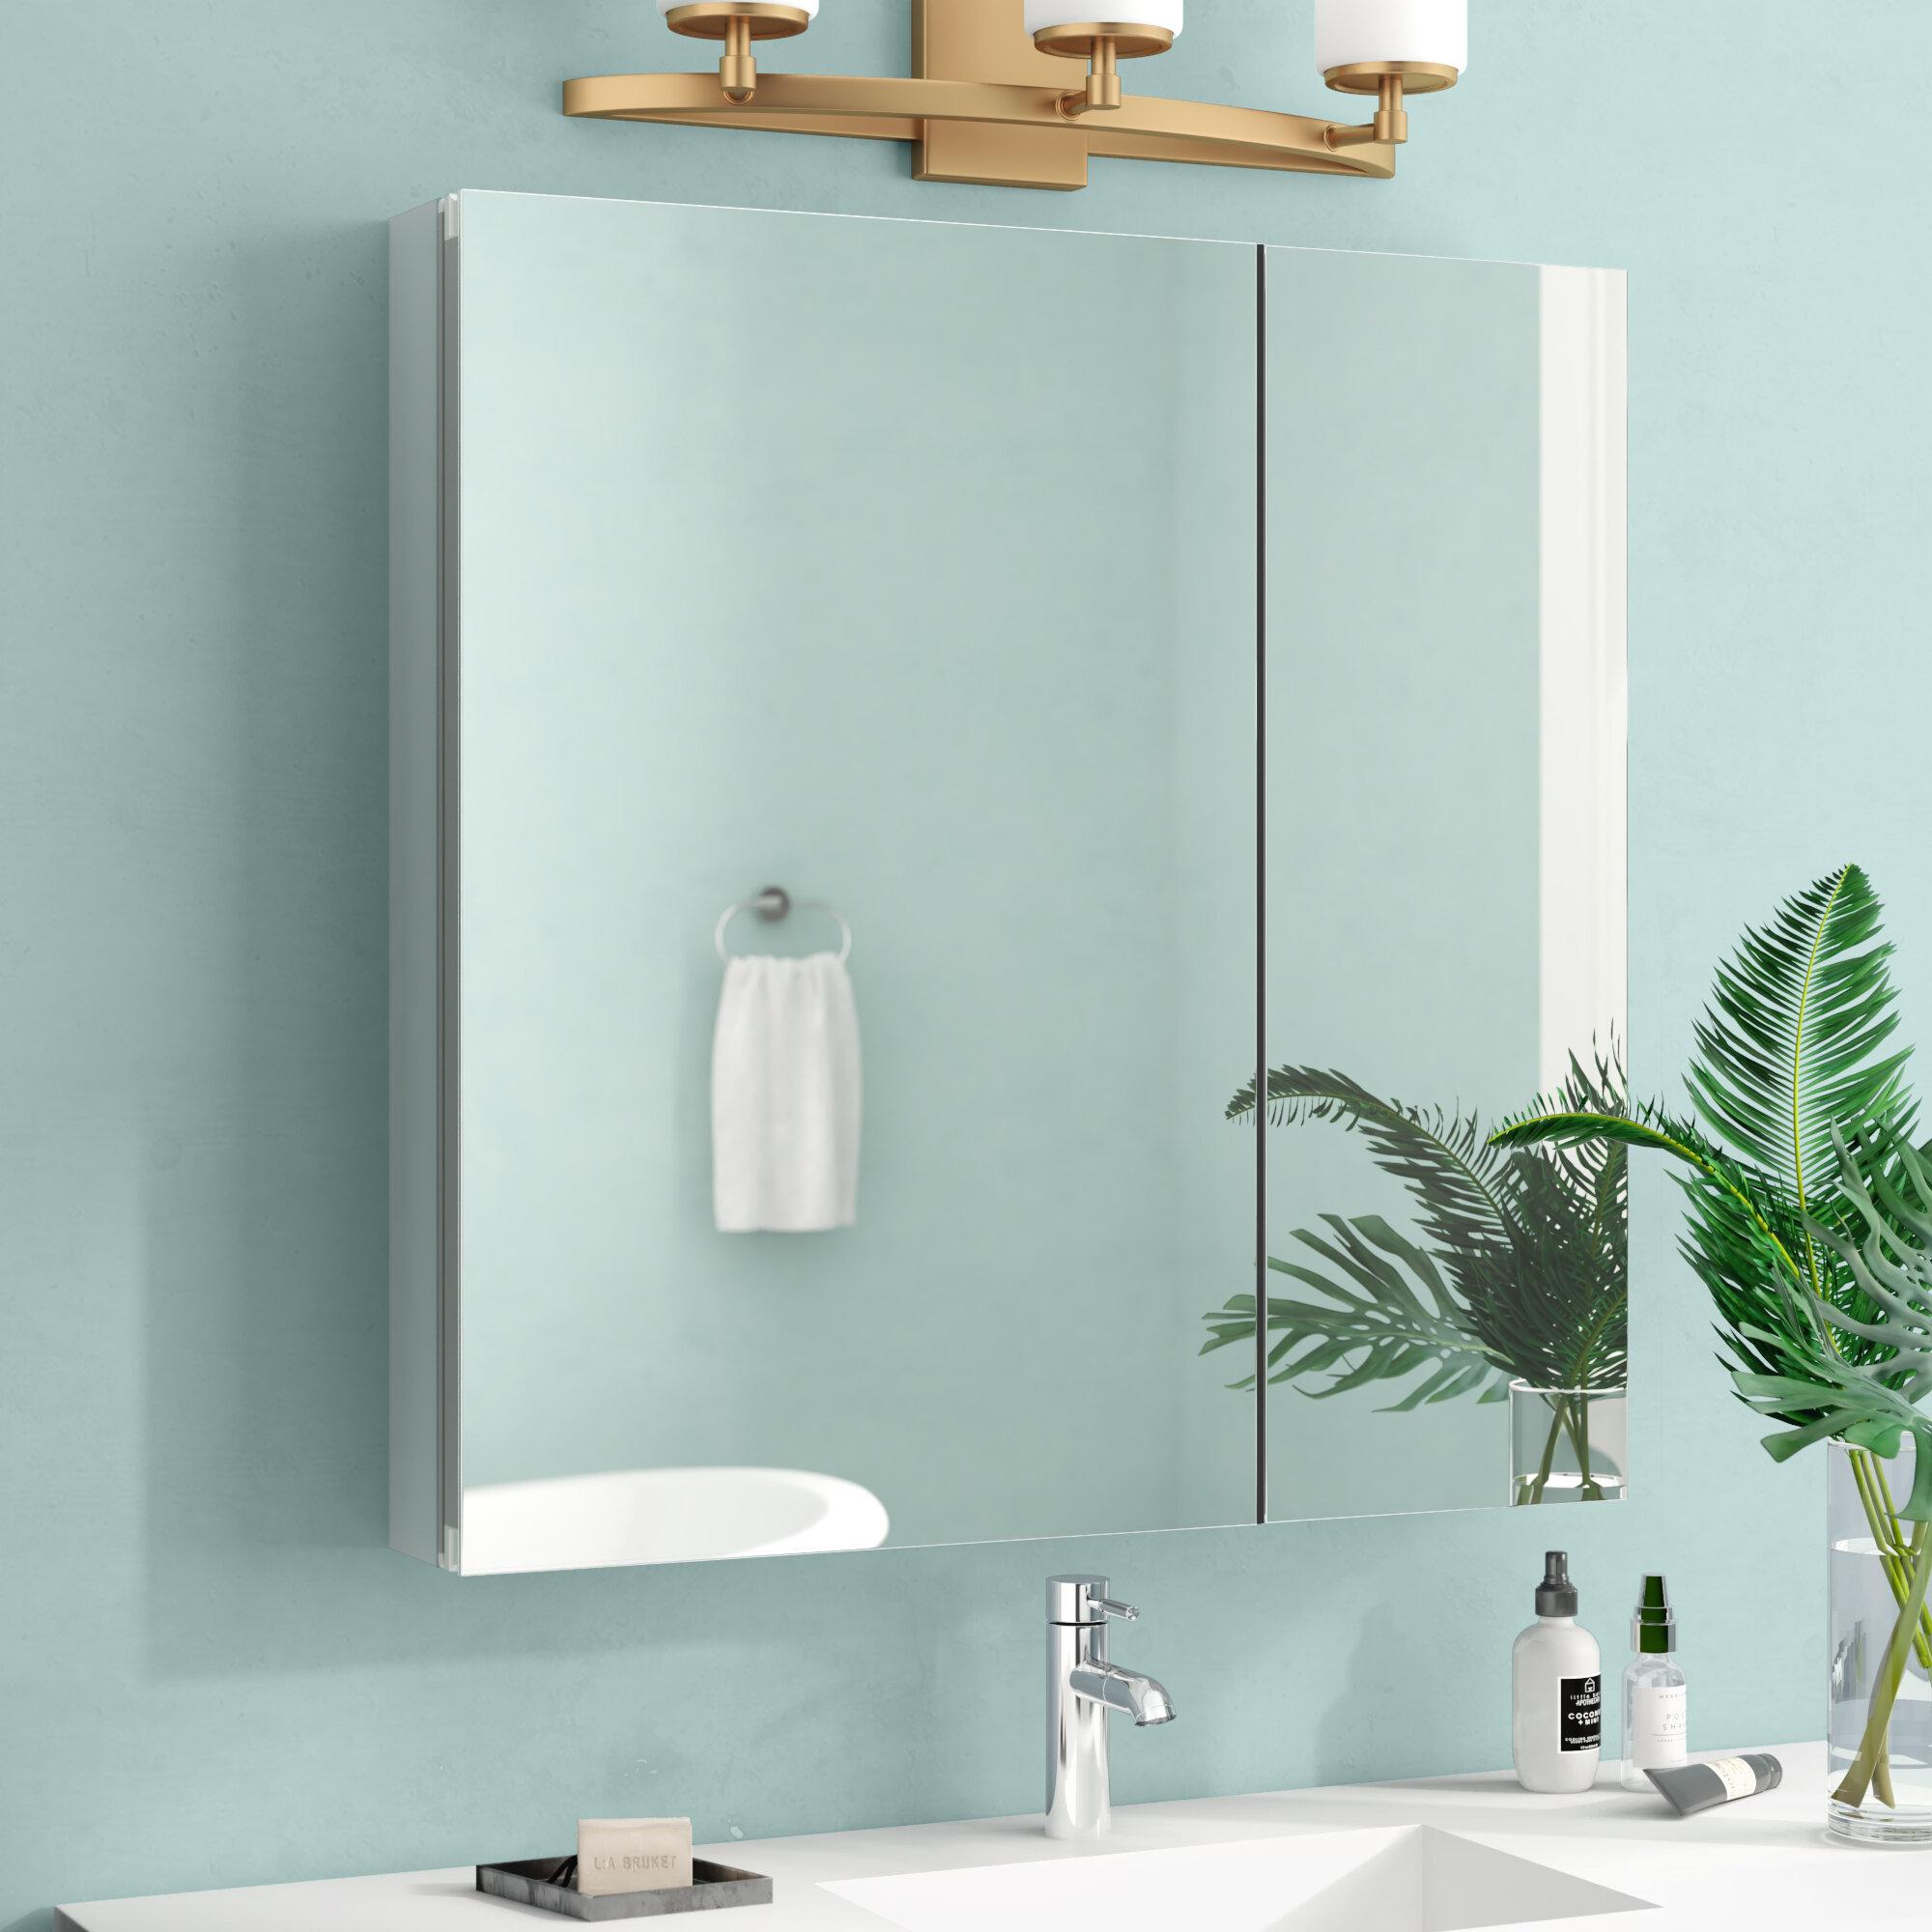 Orren Ellis Kellogg Surface Mount Or Recessed Frameless 2 Doors Medicine Cabinet With 3 Adjustable Shelves Reviews Wayfair